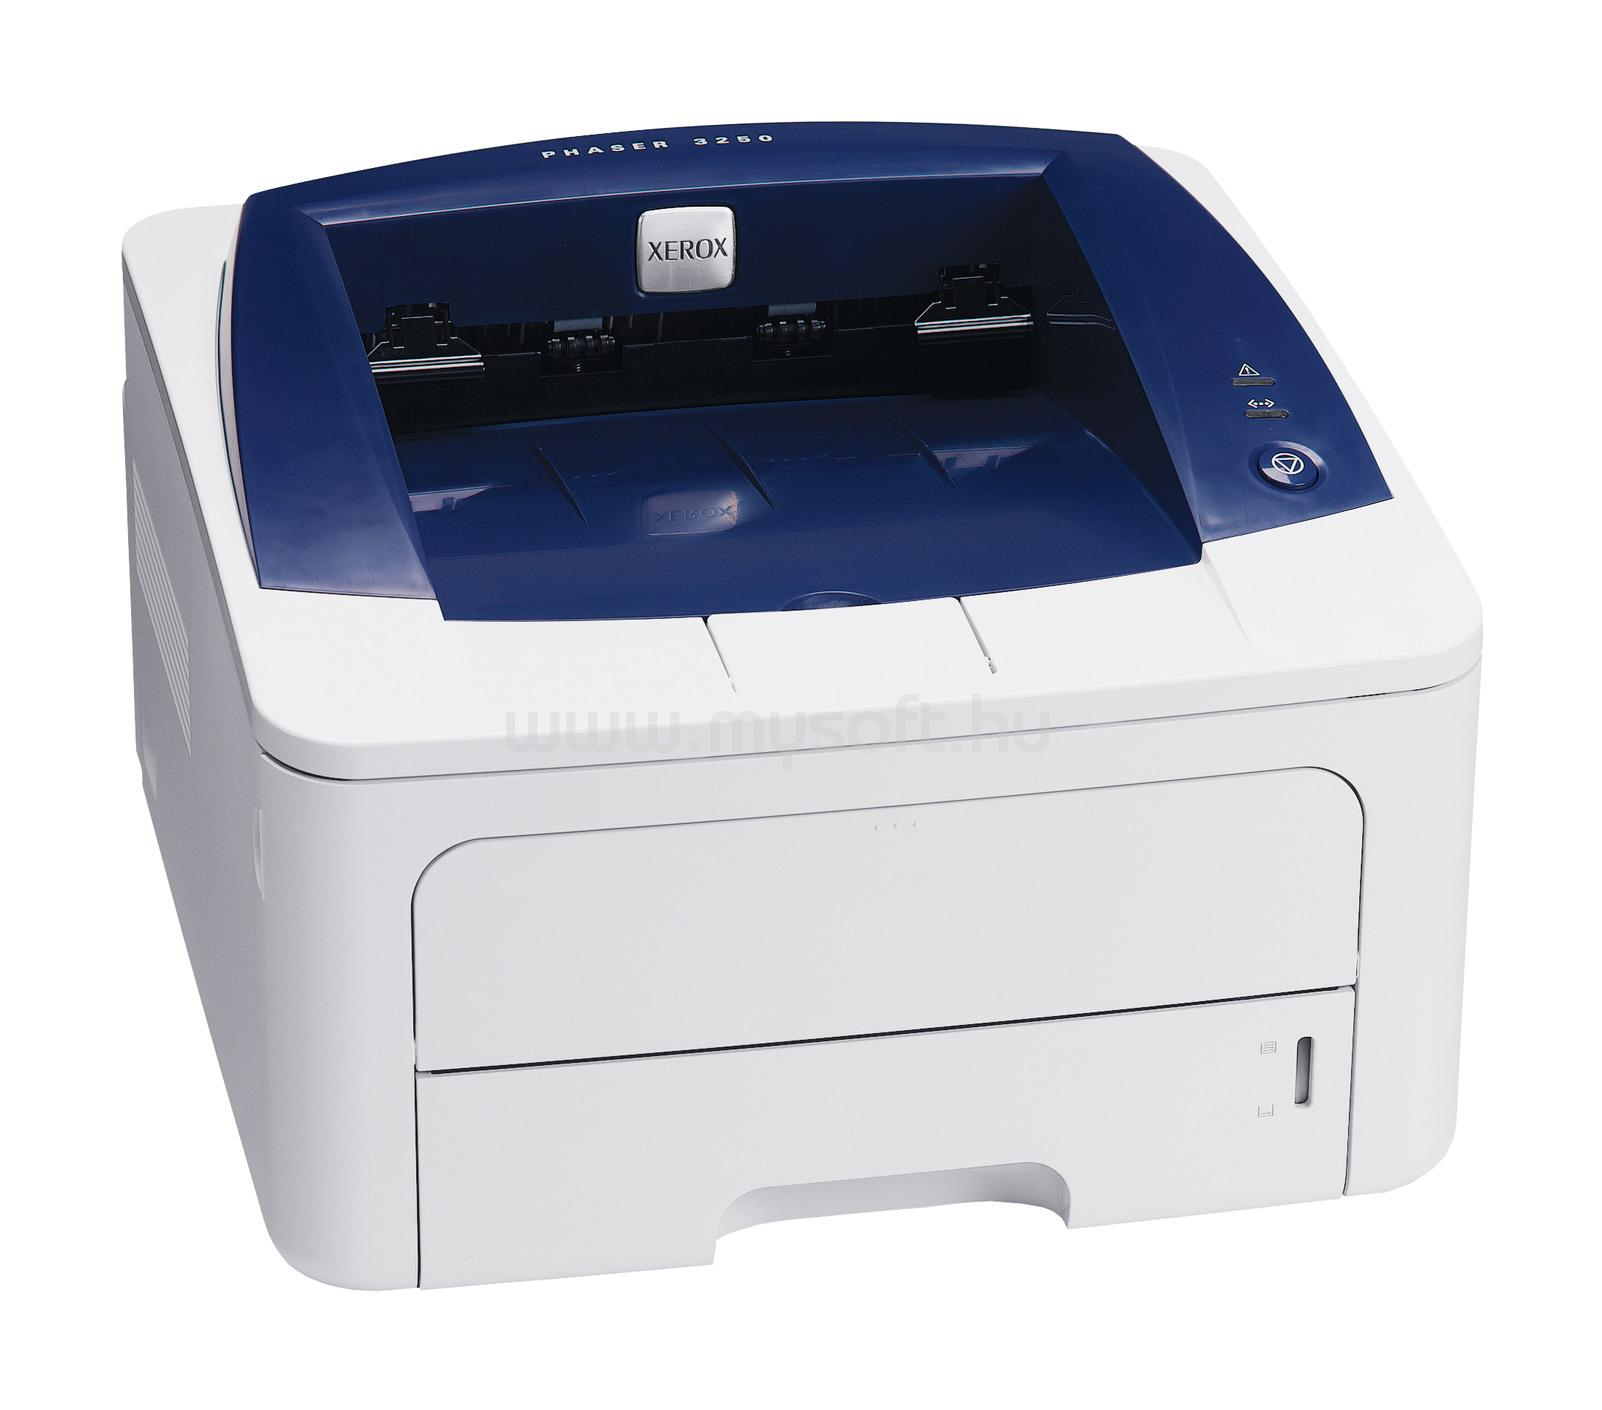 Прошивка аппарата Xerox  Phaser 3250D